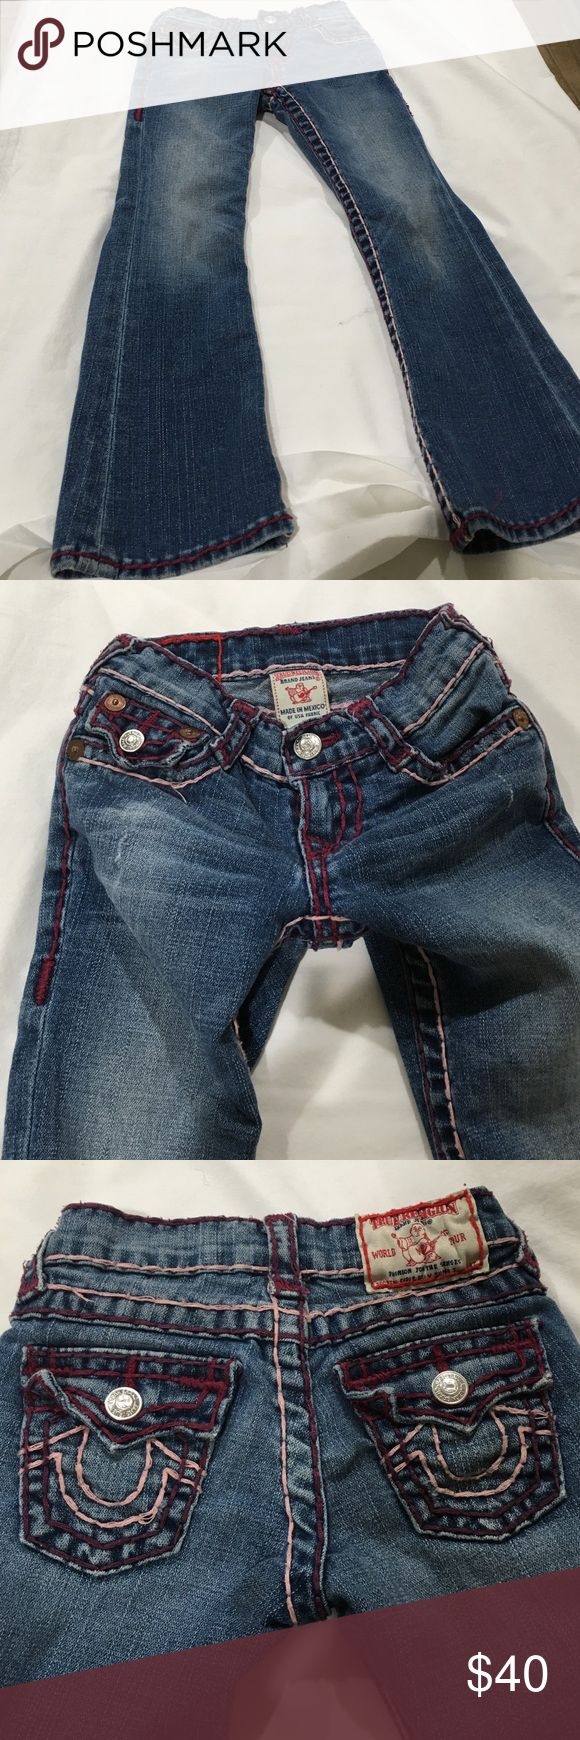 1000 ideas about true religion jeans on pinterest true religion jeans outlet and jeans. Black Bedroom Furniture Sets. Home Design Ideas